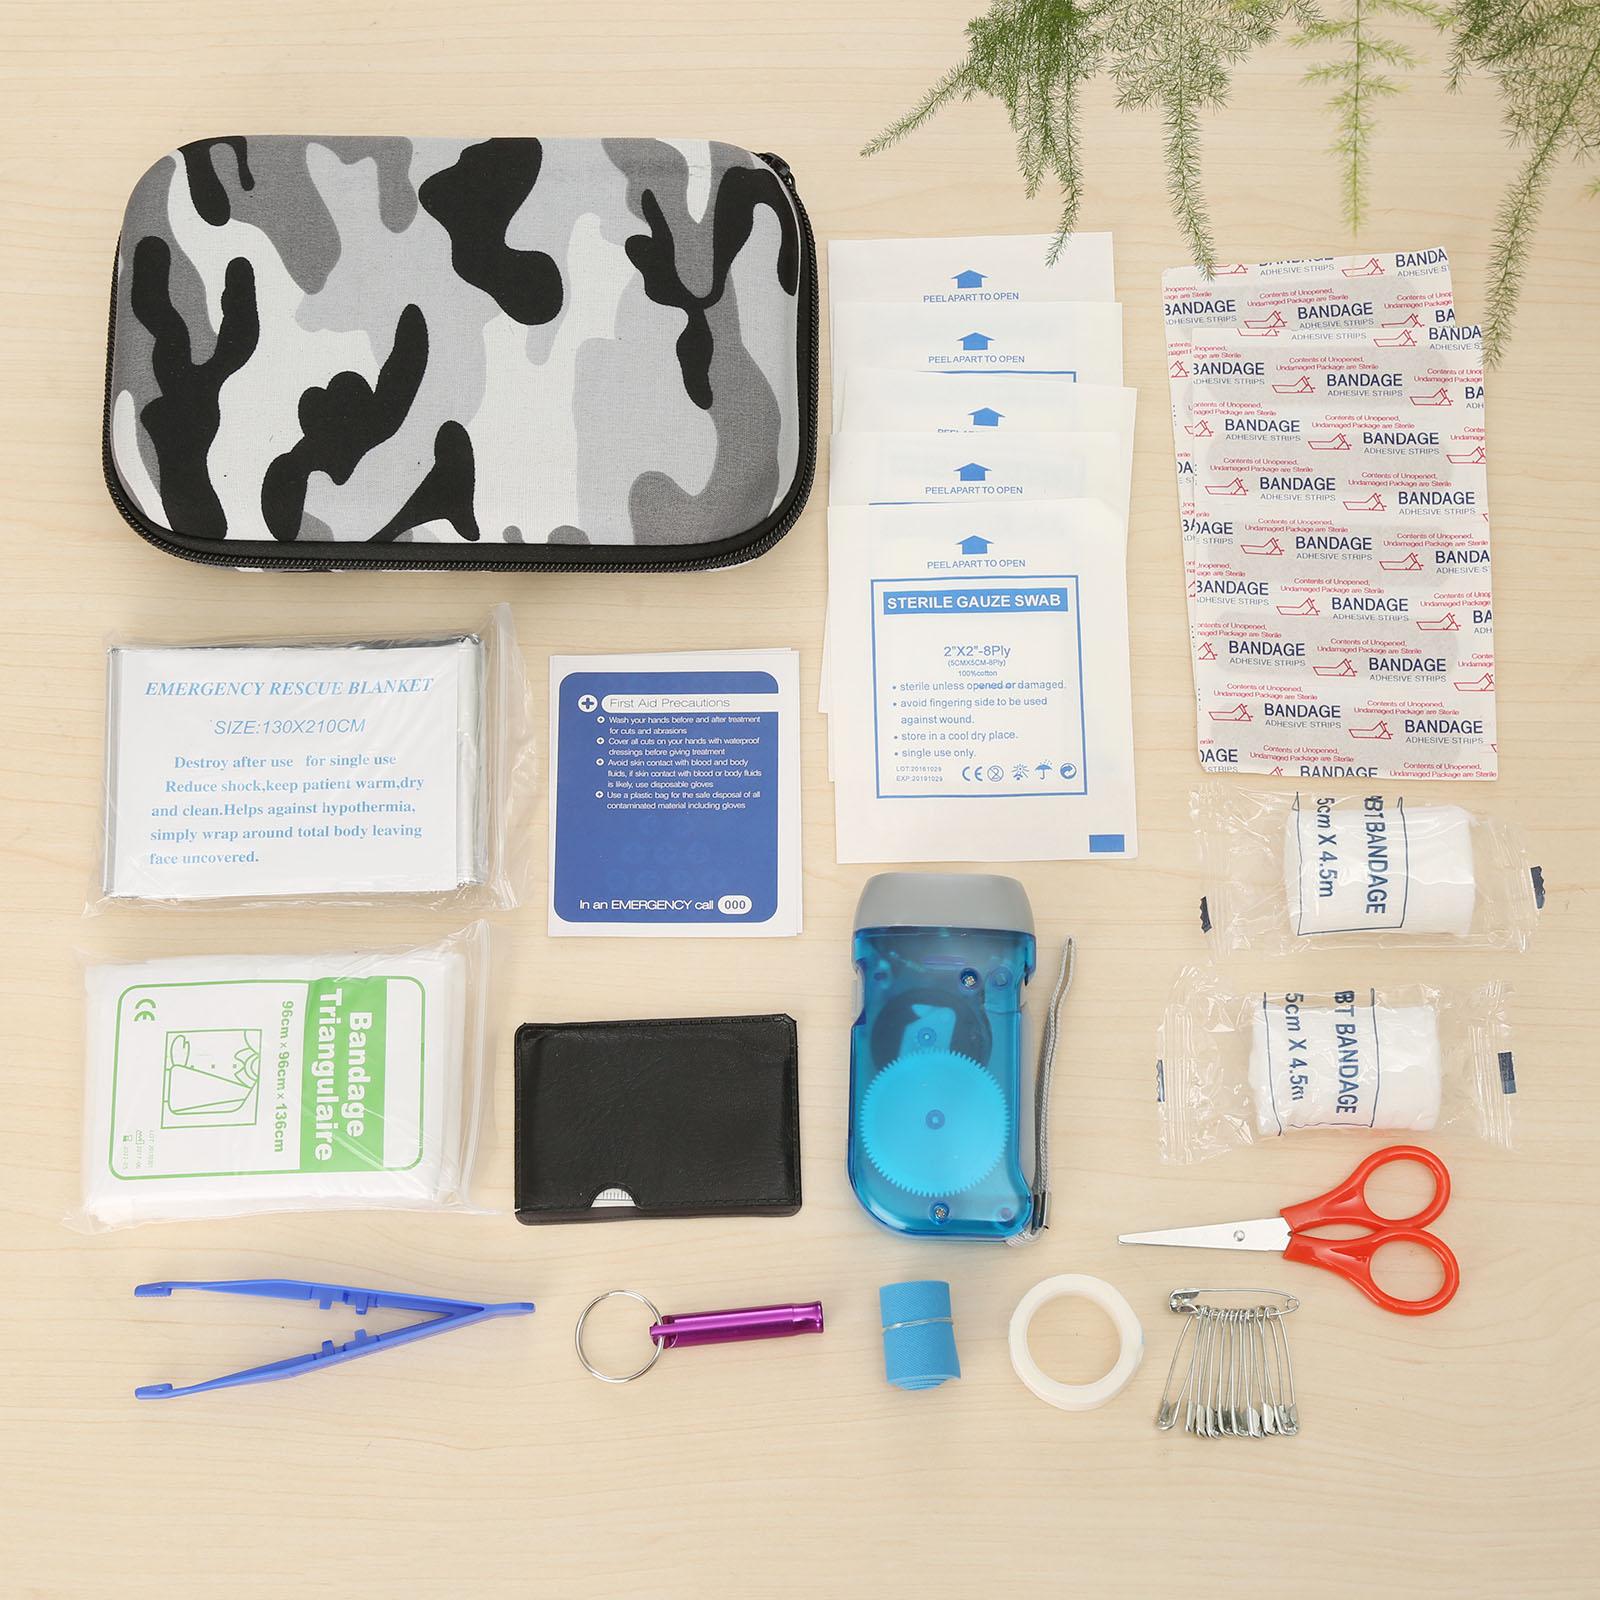 16Sets(39pcs) Travel/Car First Aid Kit Eva Bag Medical Emergency Survival Kits Pouch Portable Treatment Pack 3-color Camouflage